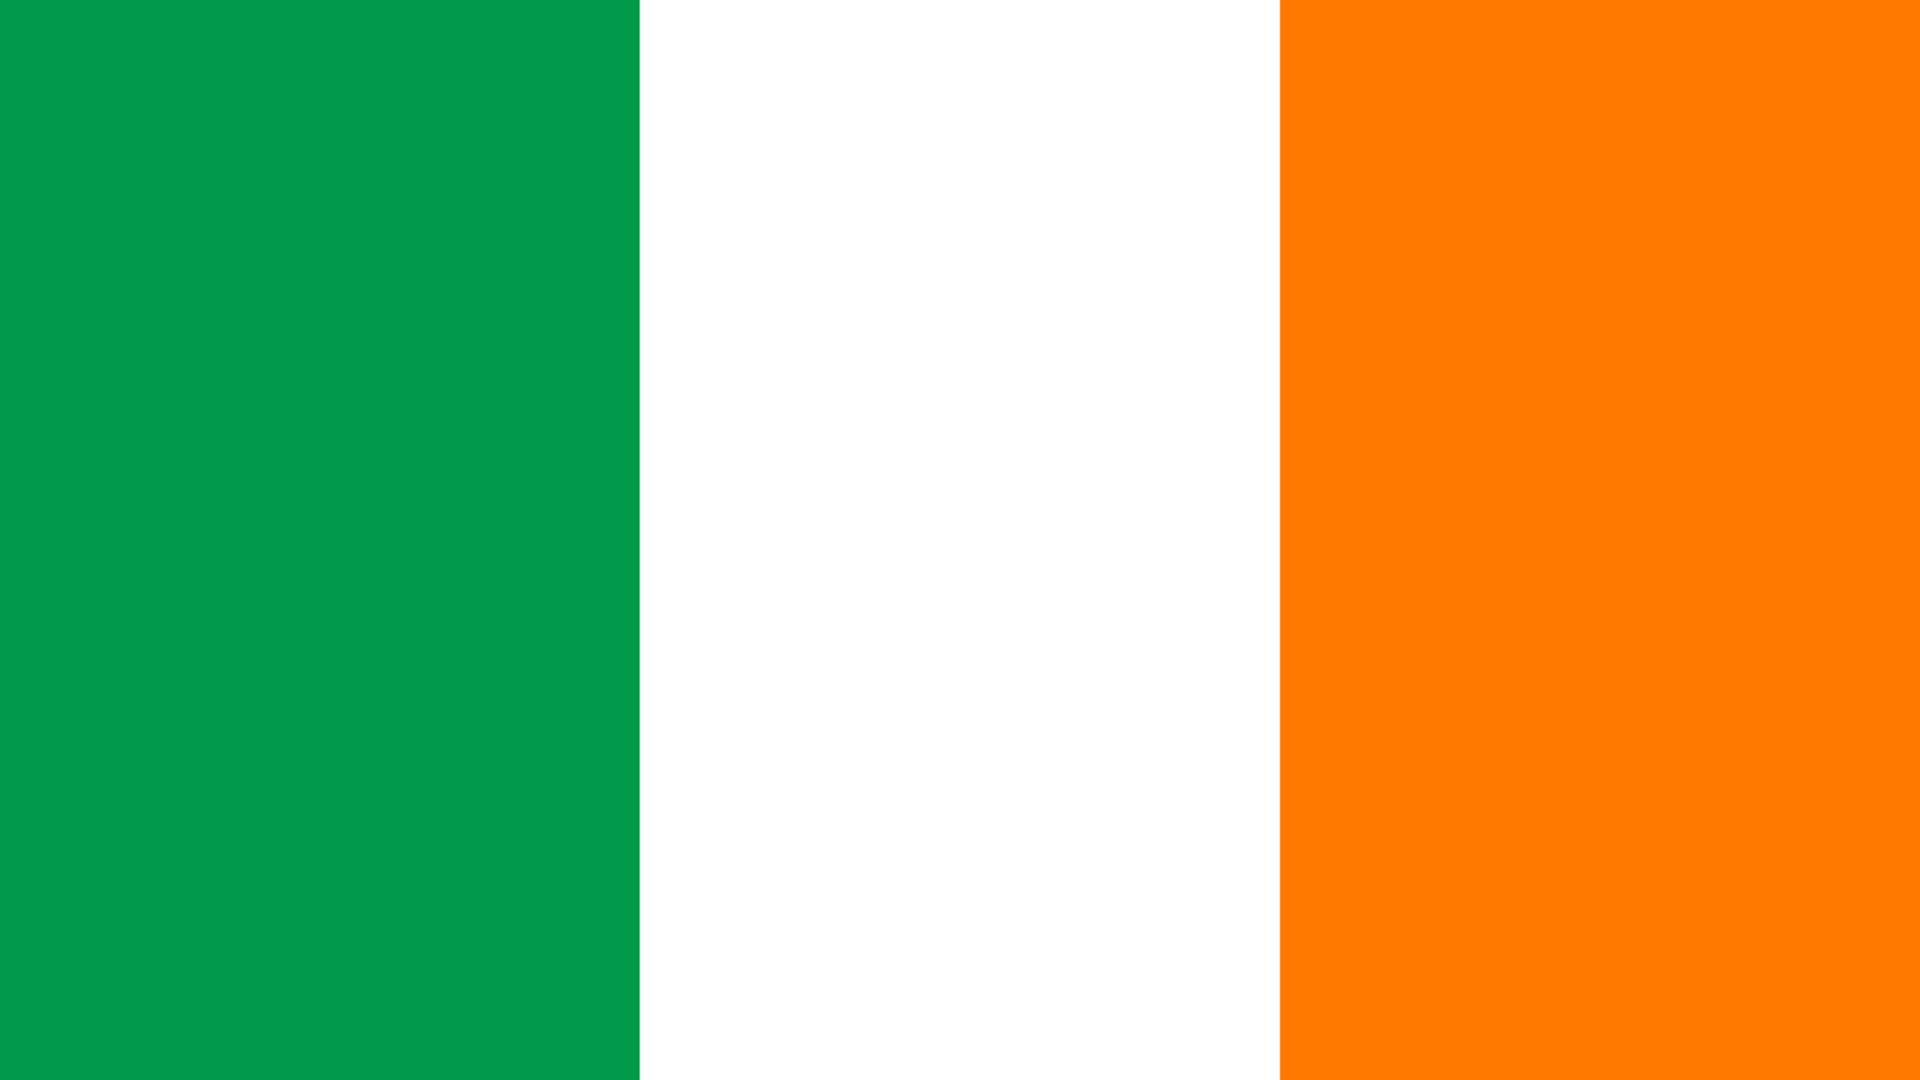 Ireland Flag   Wallpaper High Definition High Quality Widescreen 1920x1080